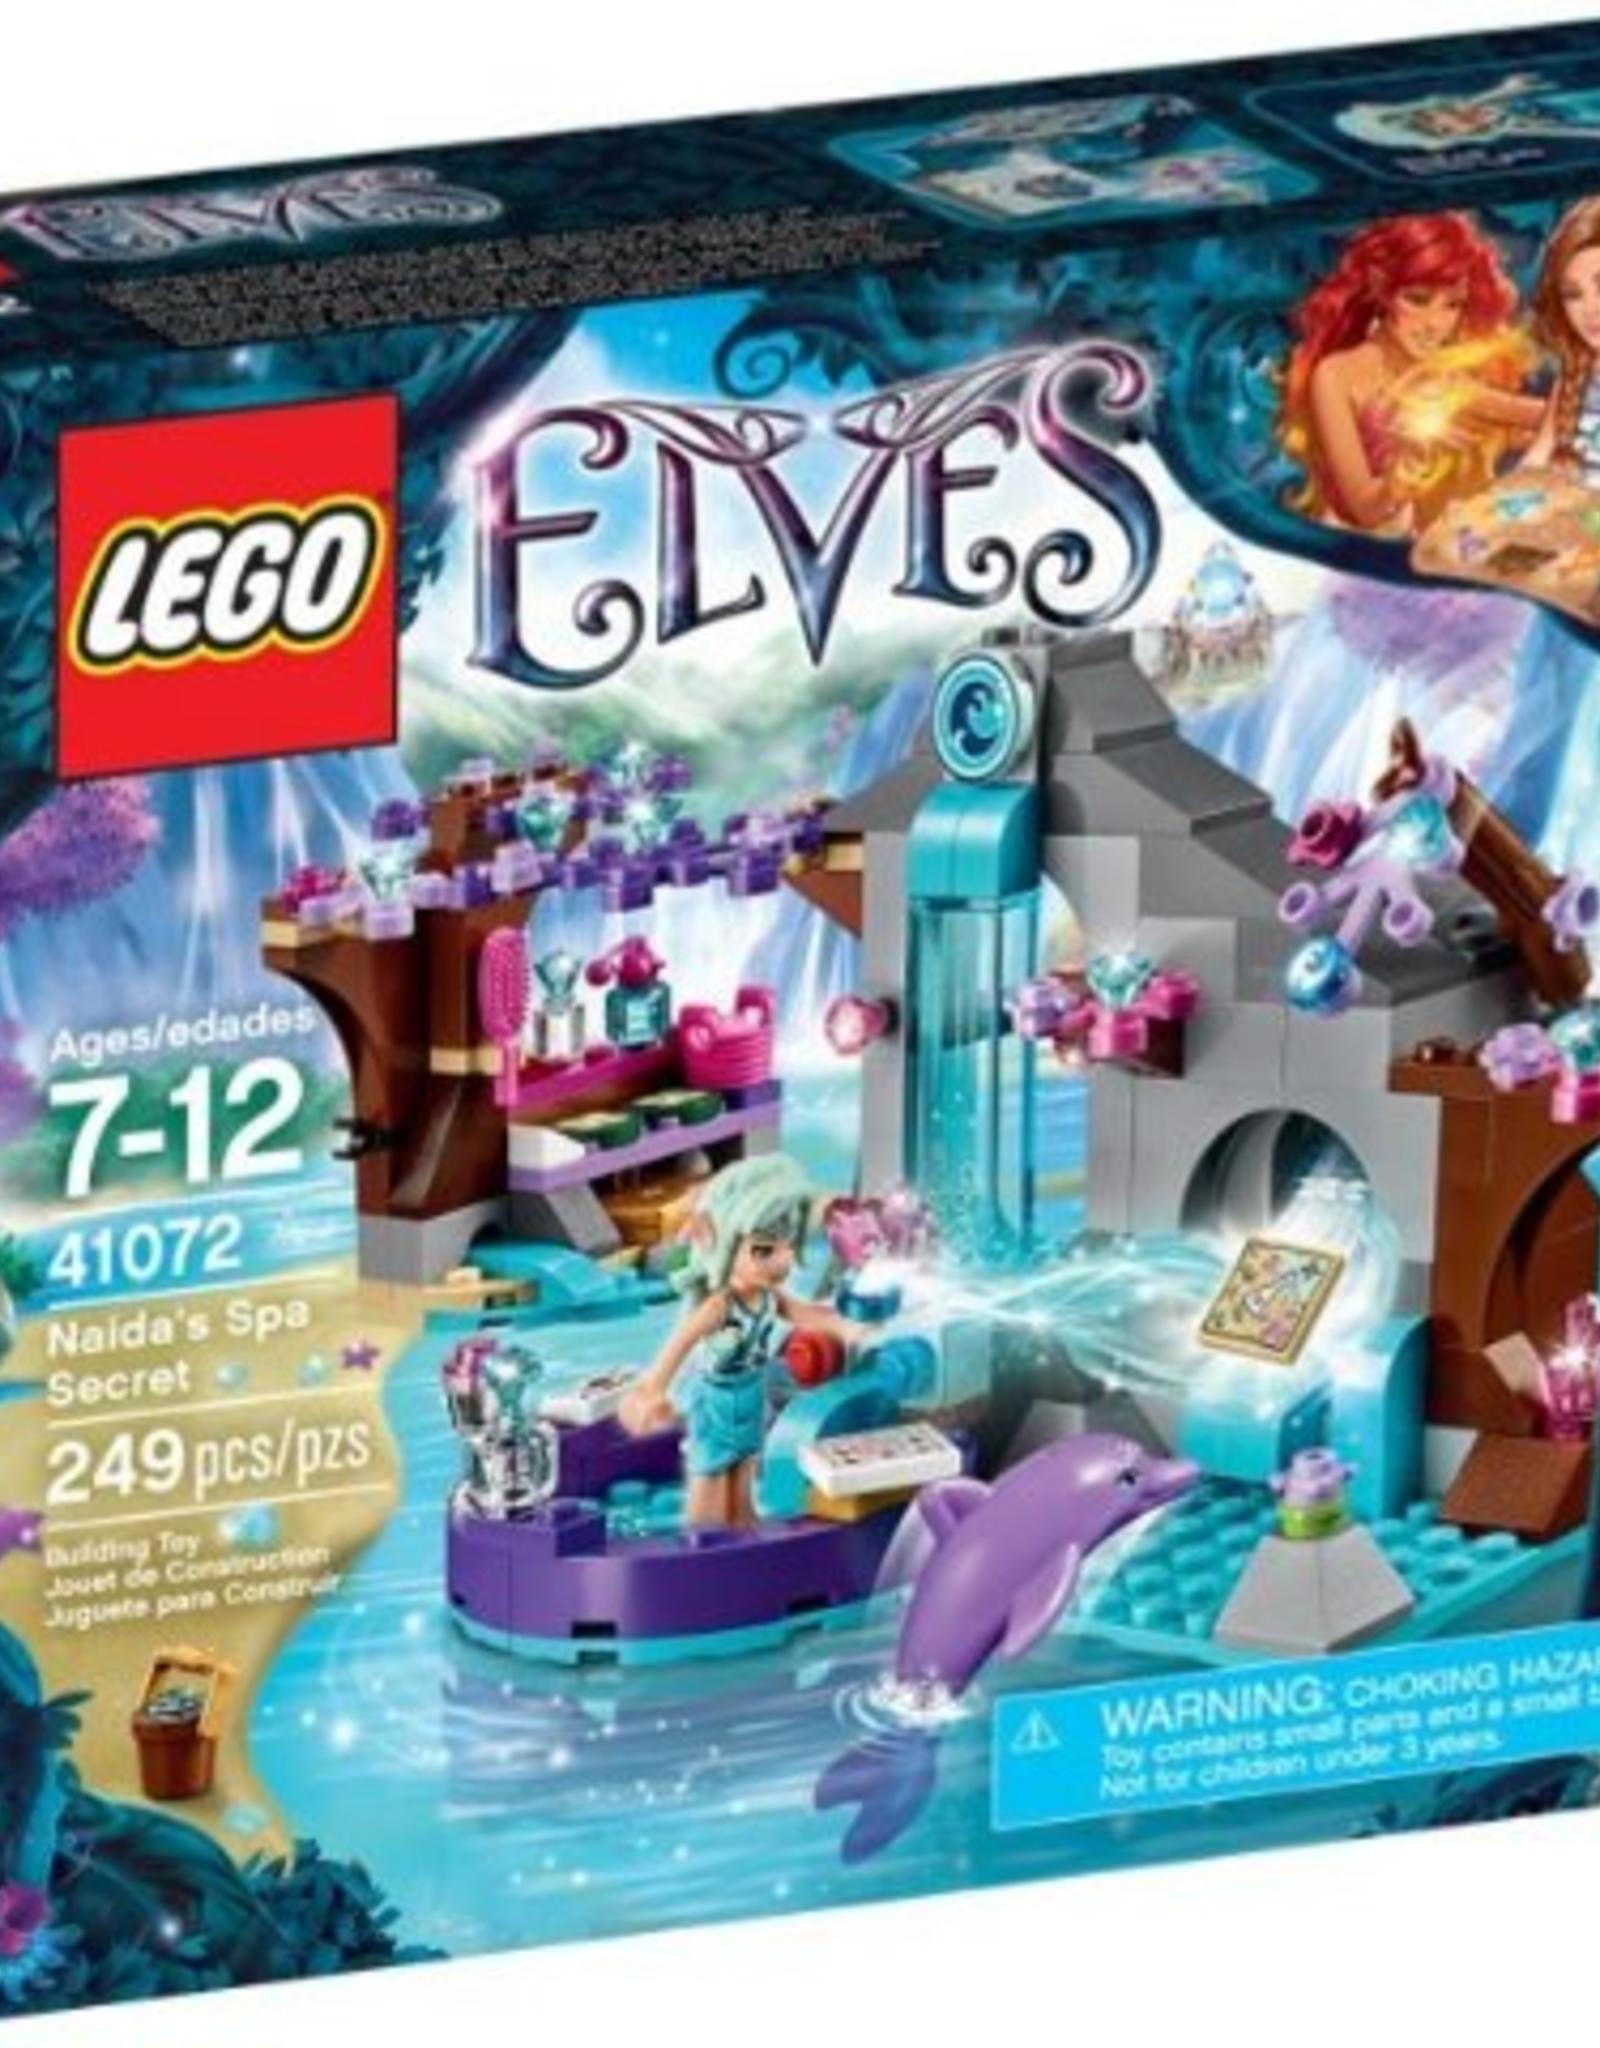 LEGO LEGO 41072 Naida's Spa Secret ELVES